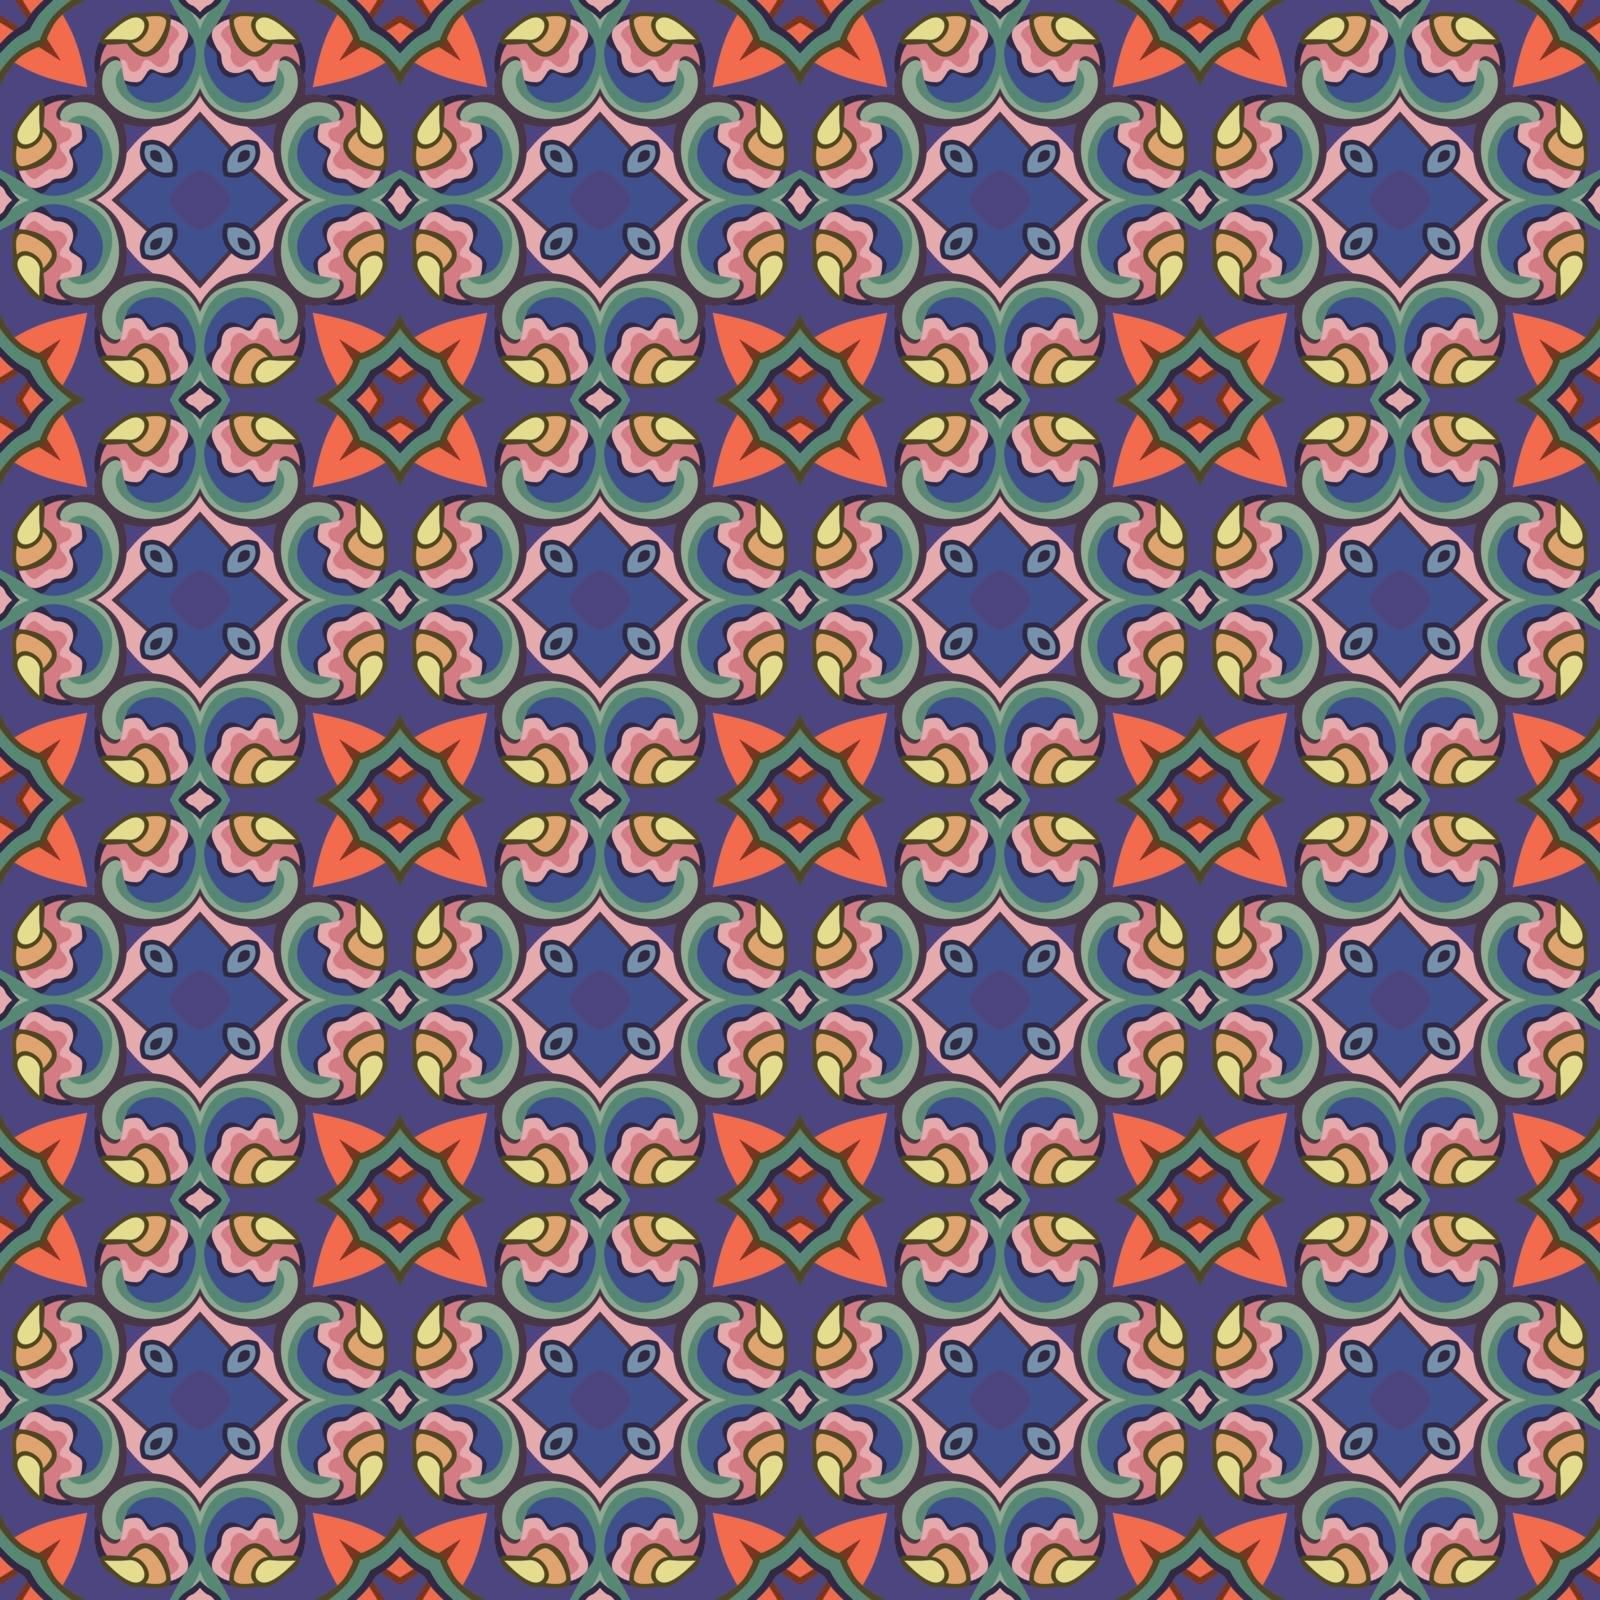 Seamless pattern by nahhan